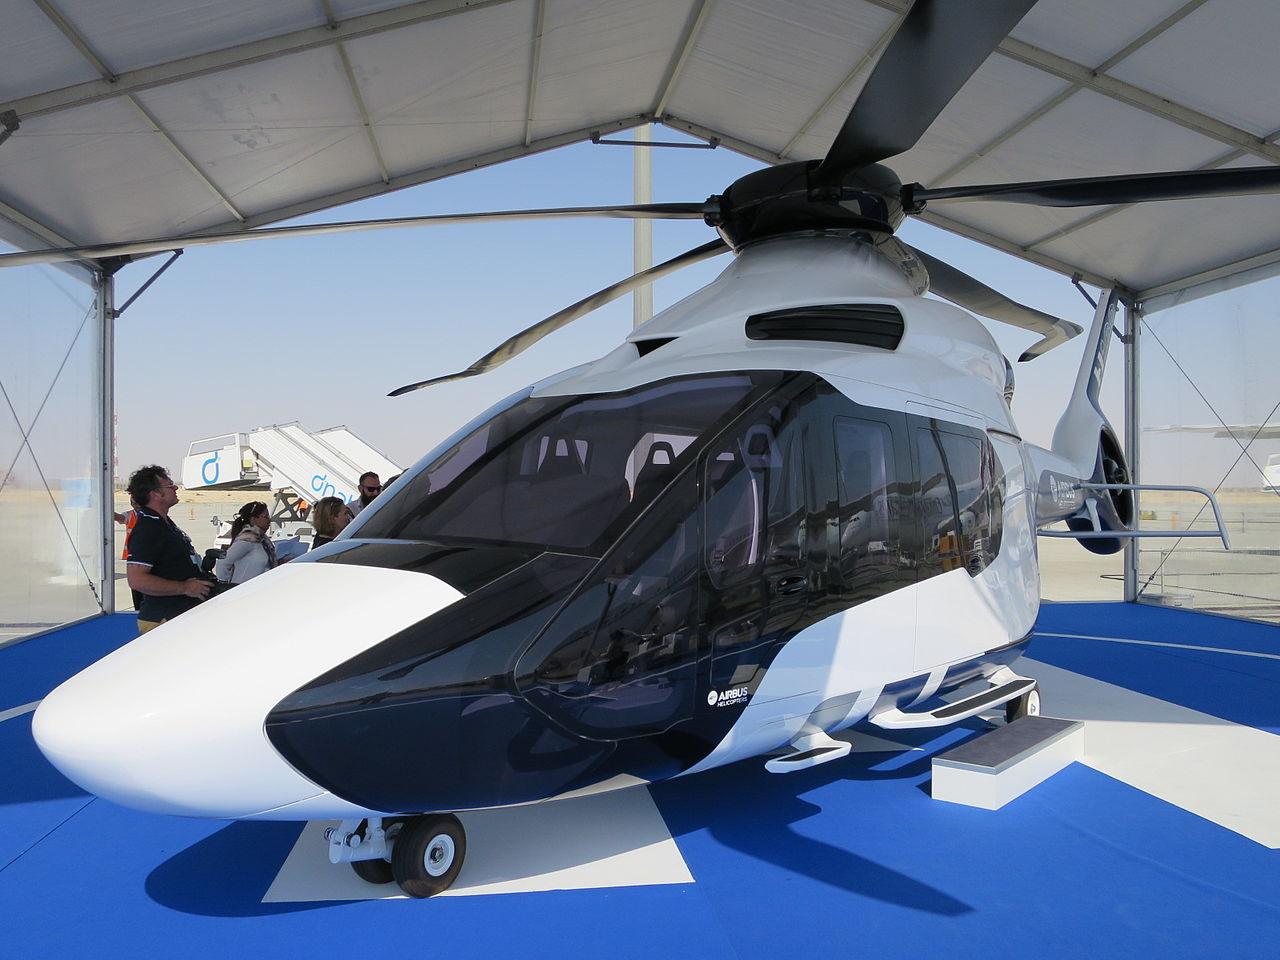 1280px-H160_mockup_at_Dubai_Airshow_2015.JPG